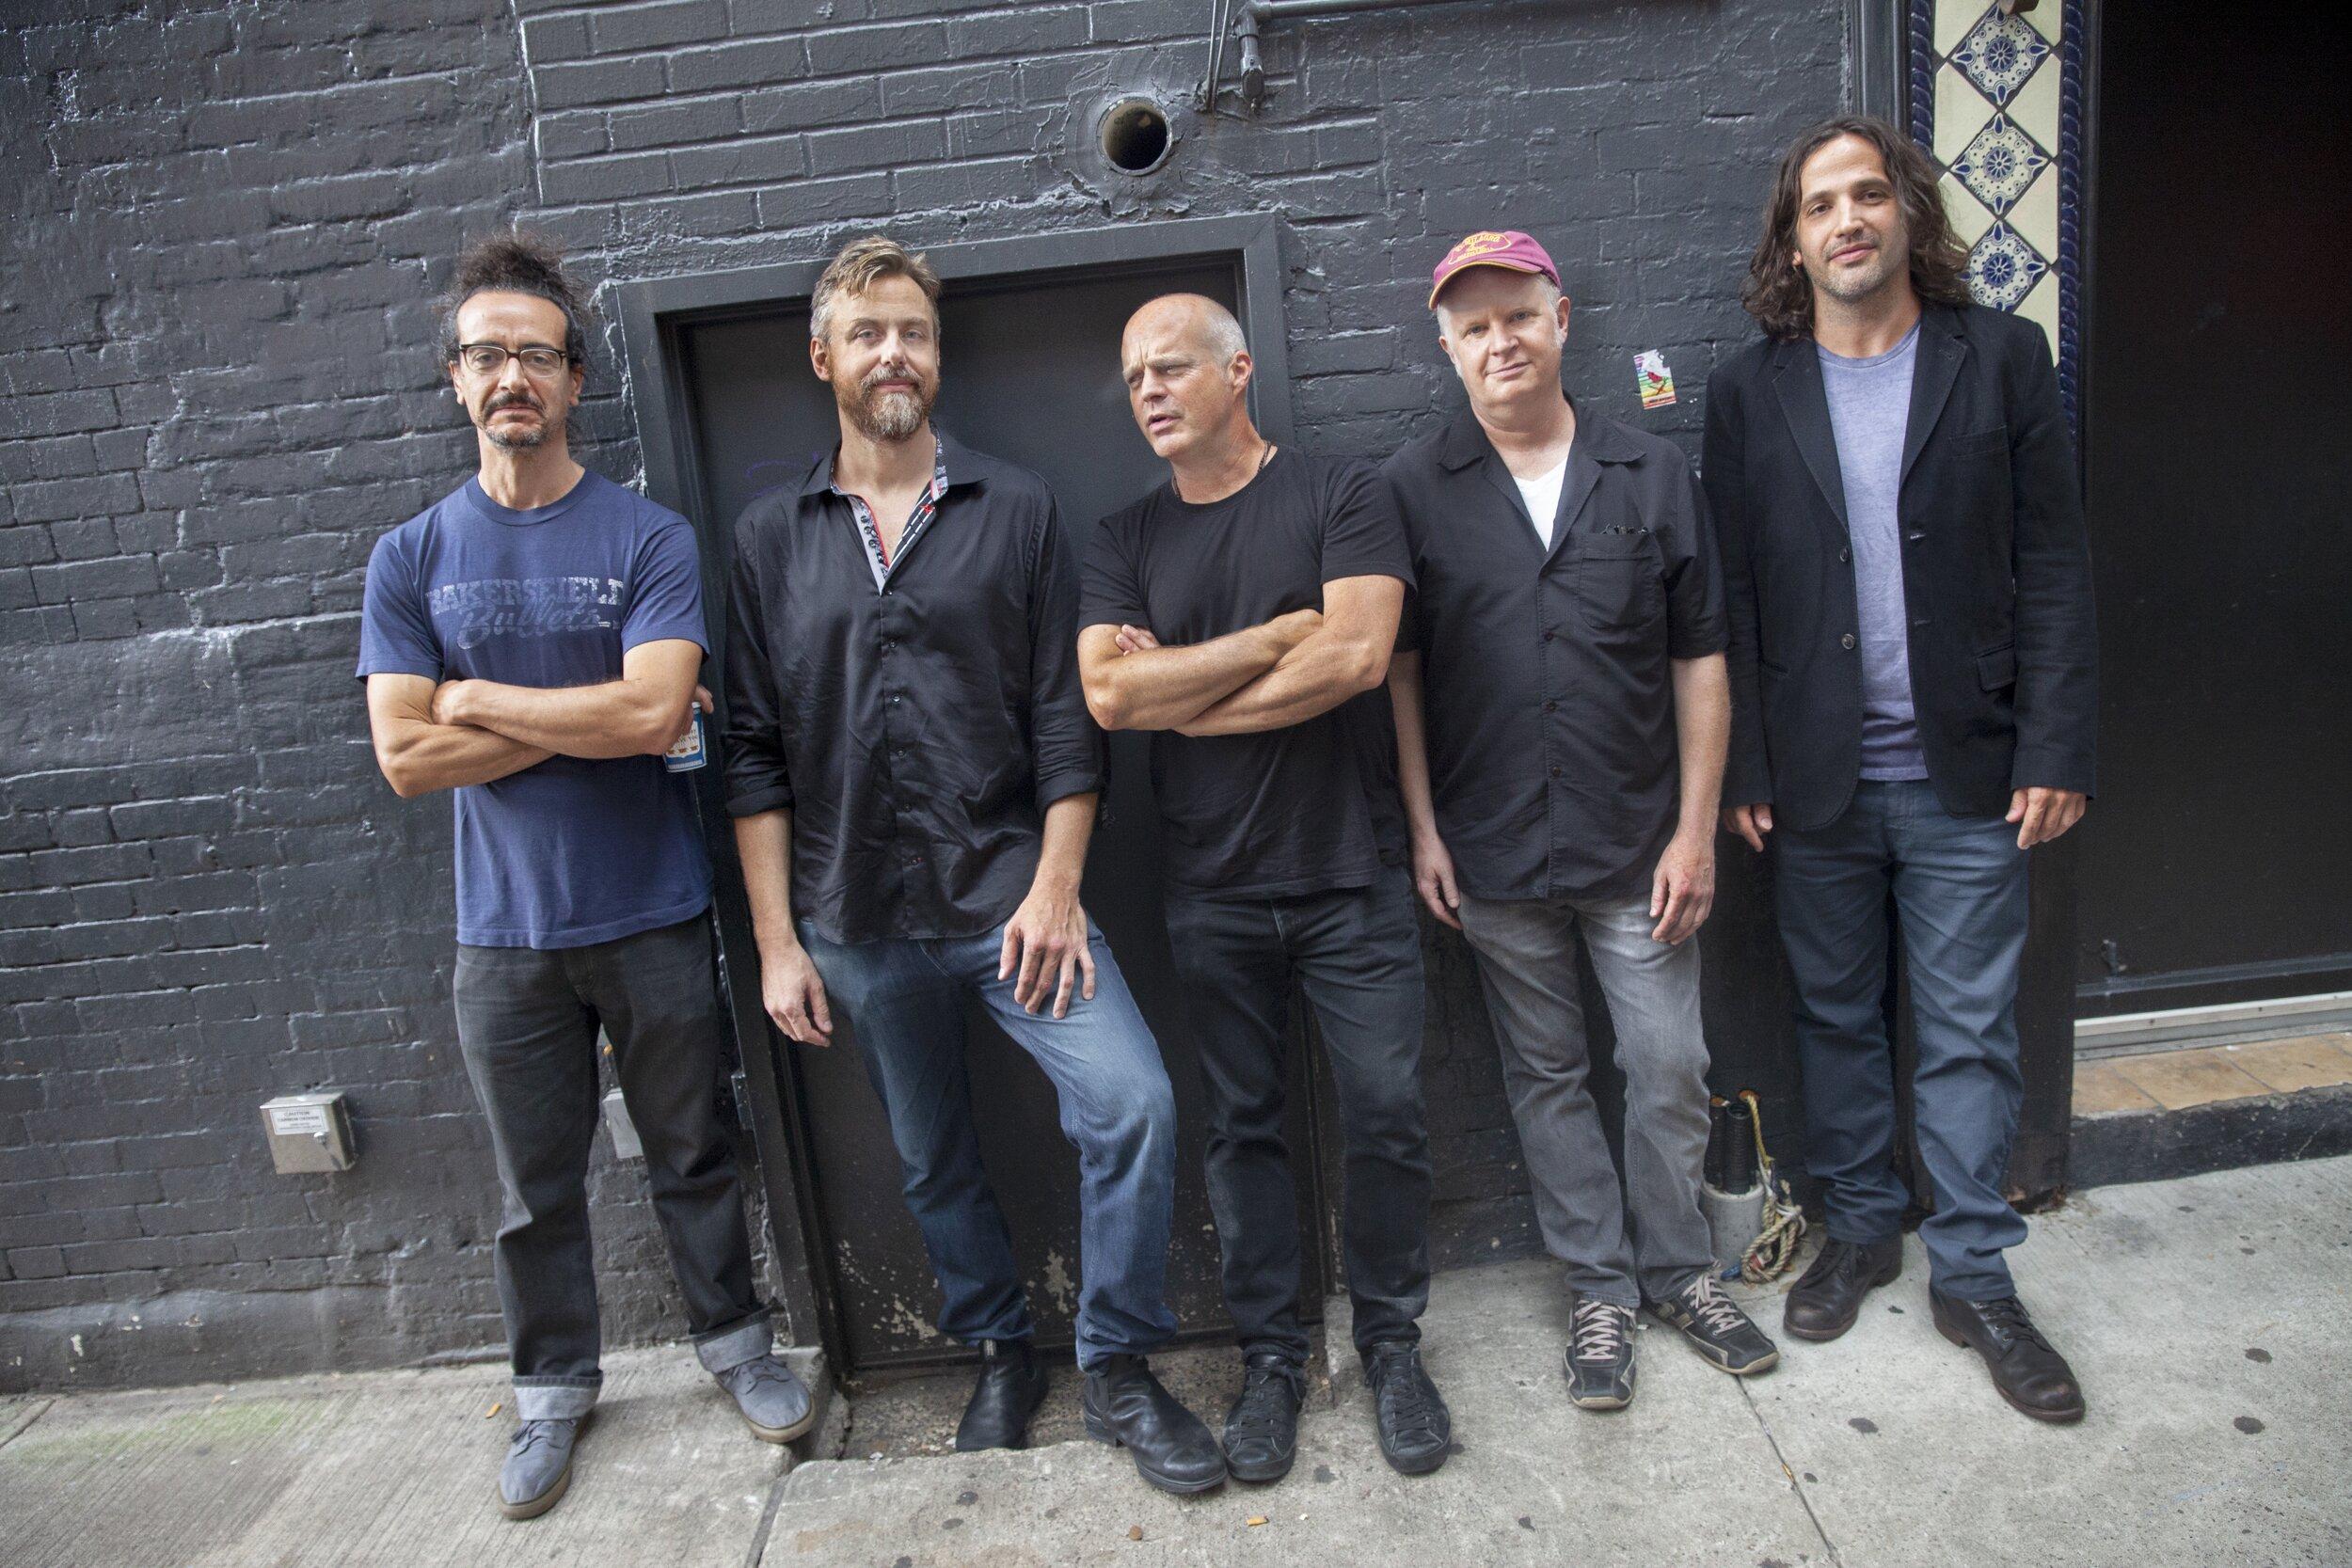 Superette with John Medeski, September, 2018, NYC (L-R: Dan Rieser, Chris Lightcap, John Medeski, Curtis Hasselbring, Jonathan Goldberger) photo credit: Bill Douthart